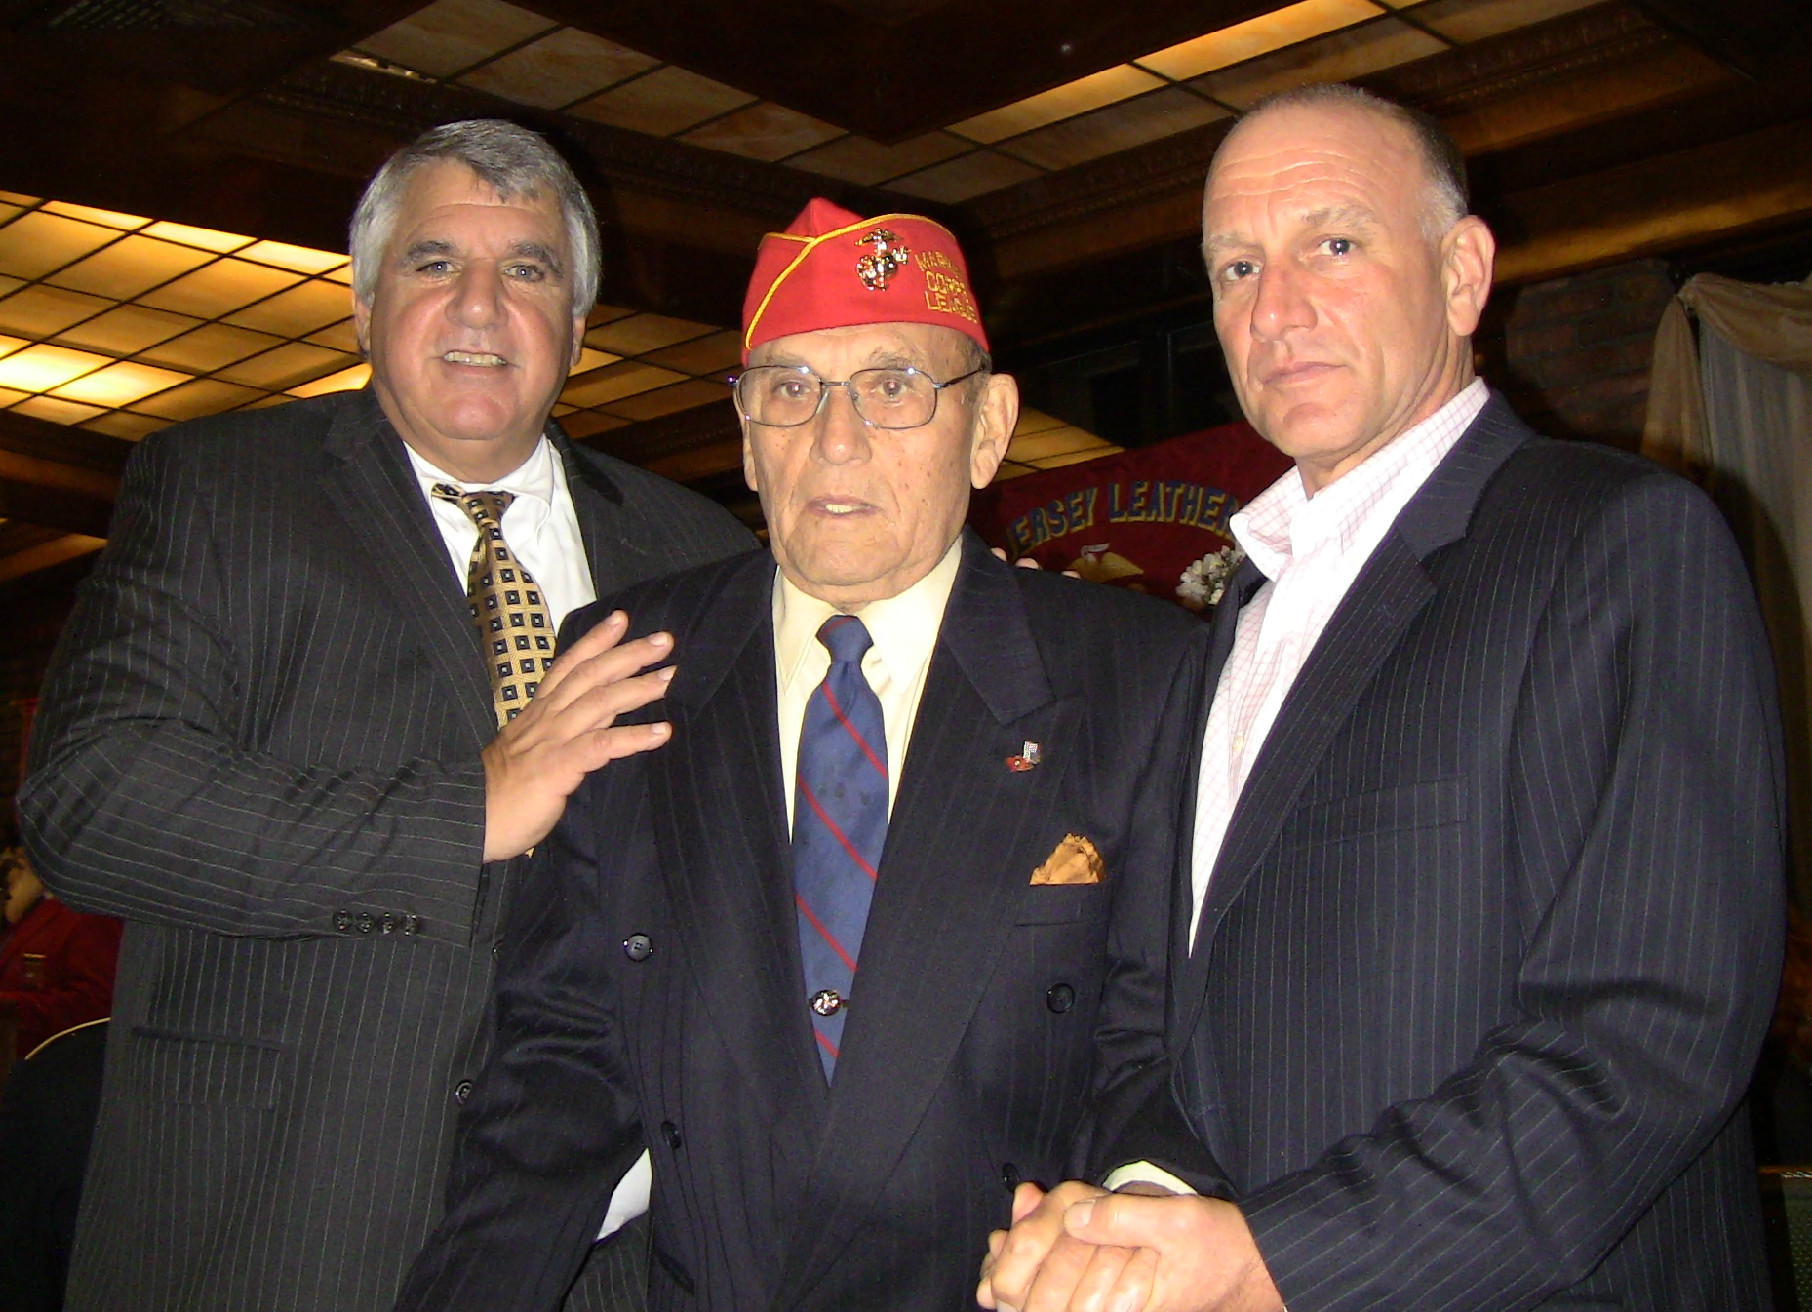 47b8909ce72656d01f16_Kevin_Glover-Mauro_Checchio-Jim_Checchio_at_Marines_Birthday_party.jpg